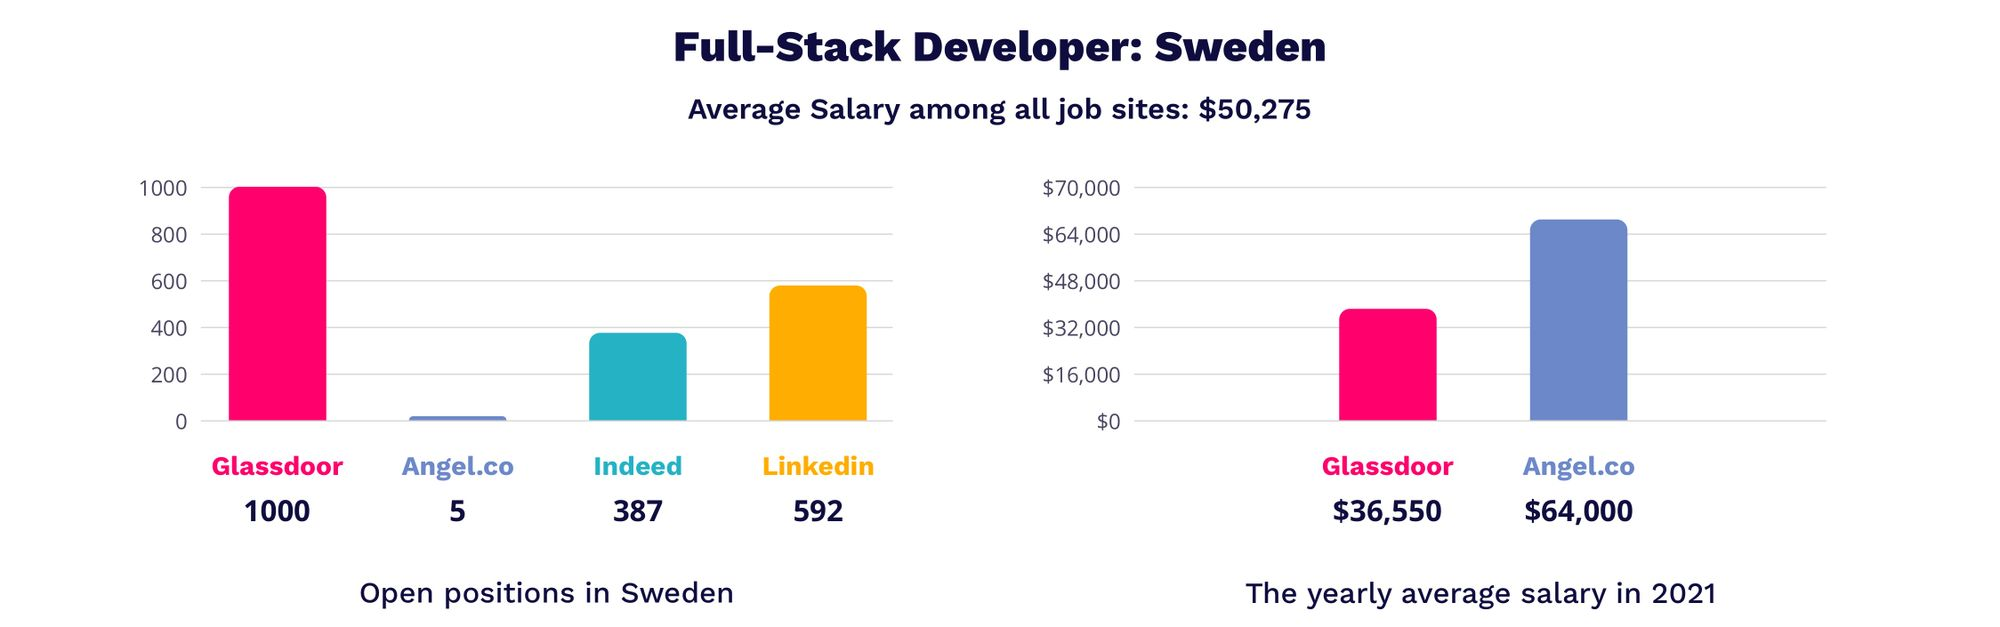 full-stack developer salaries in Sweden